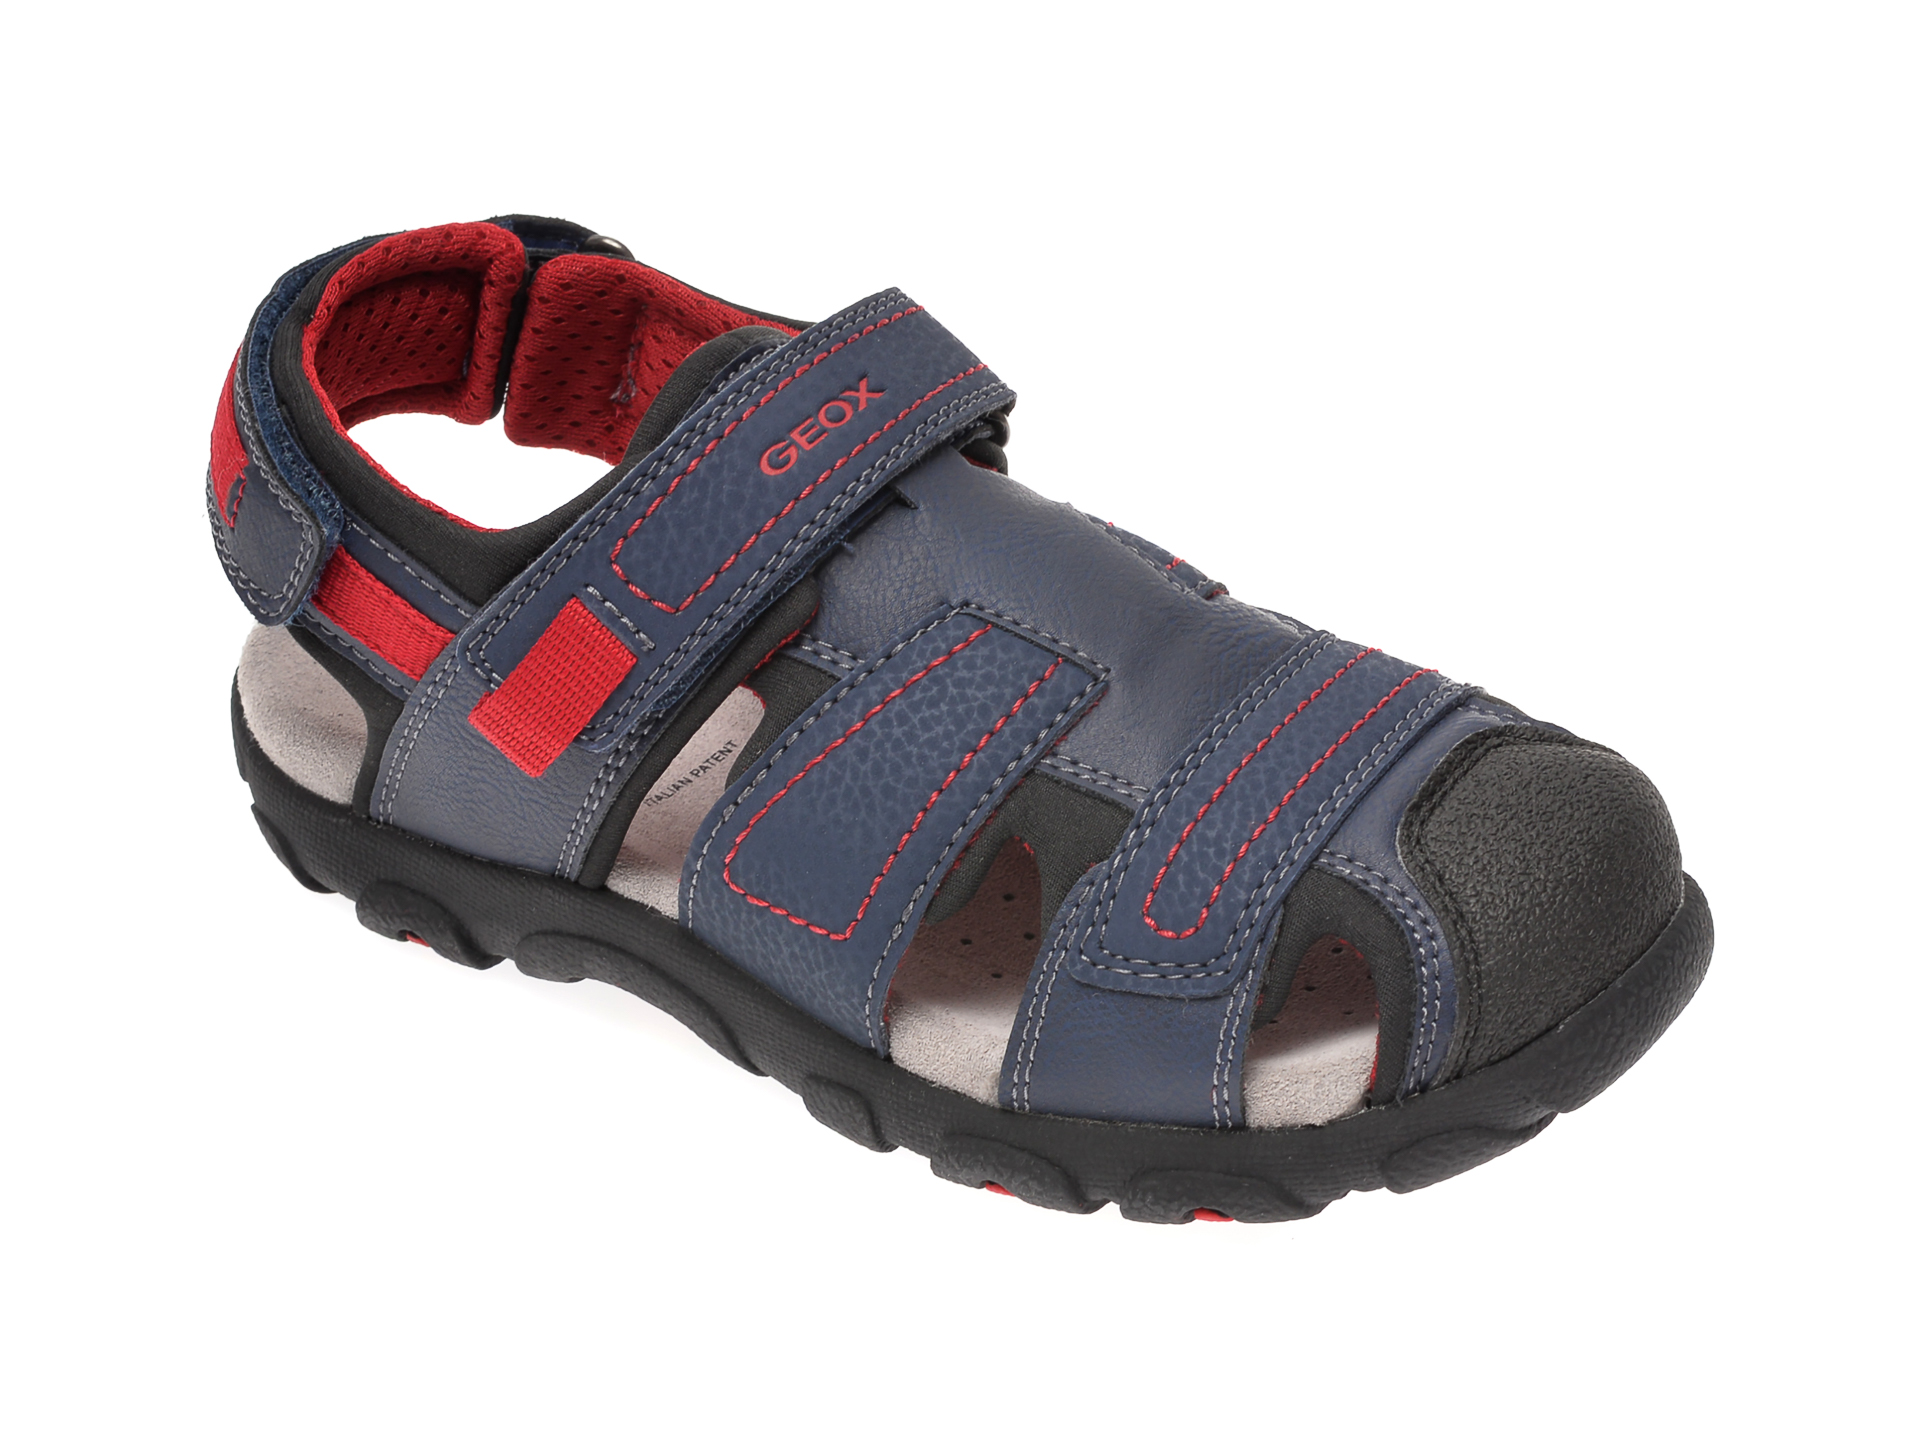 Sandale Geox Bleumarin, J0224d, Din Piele Ecologica